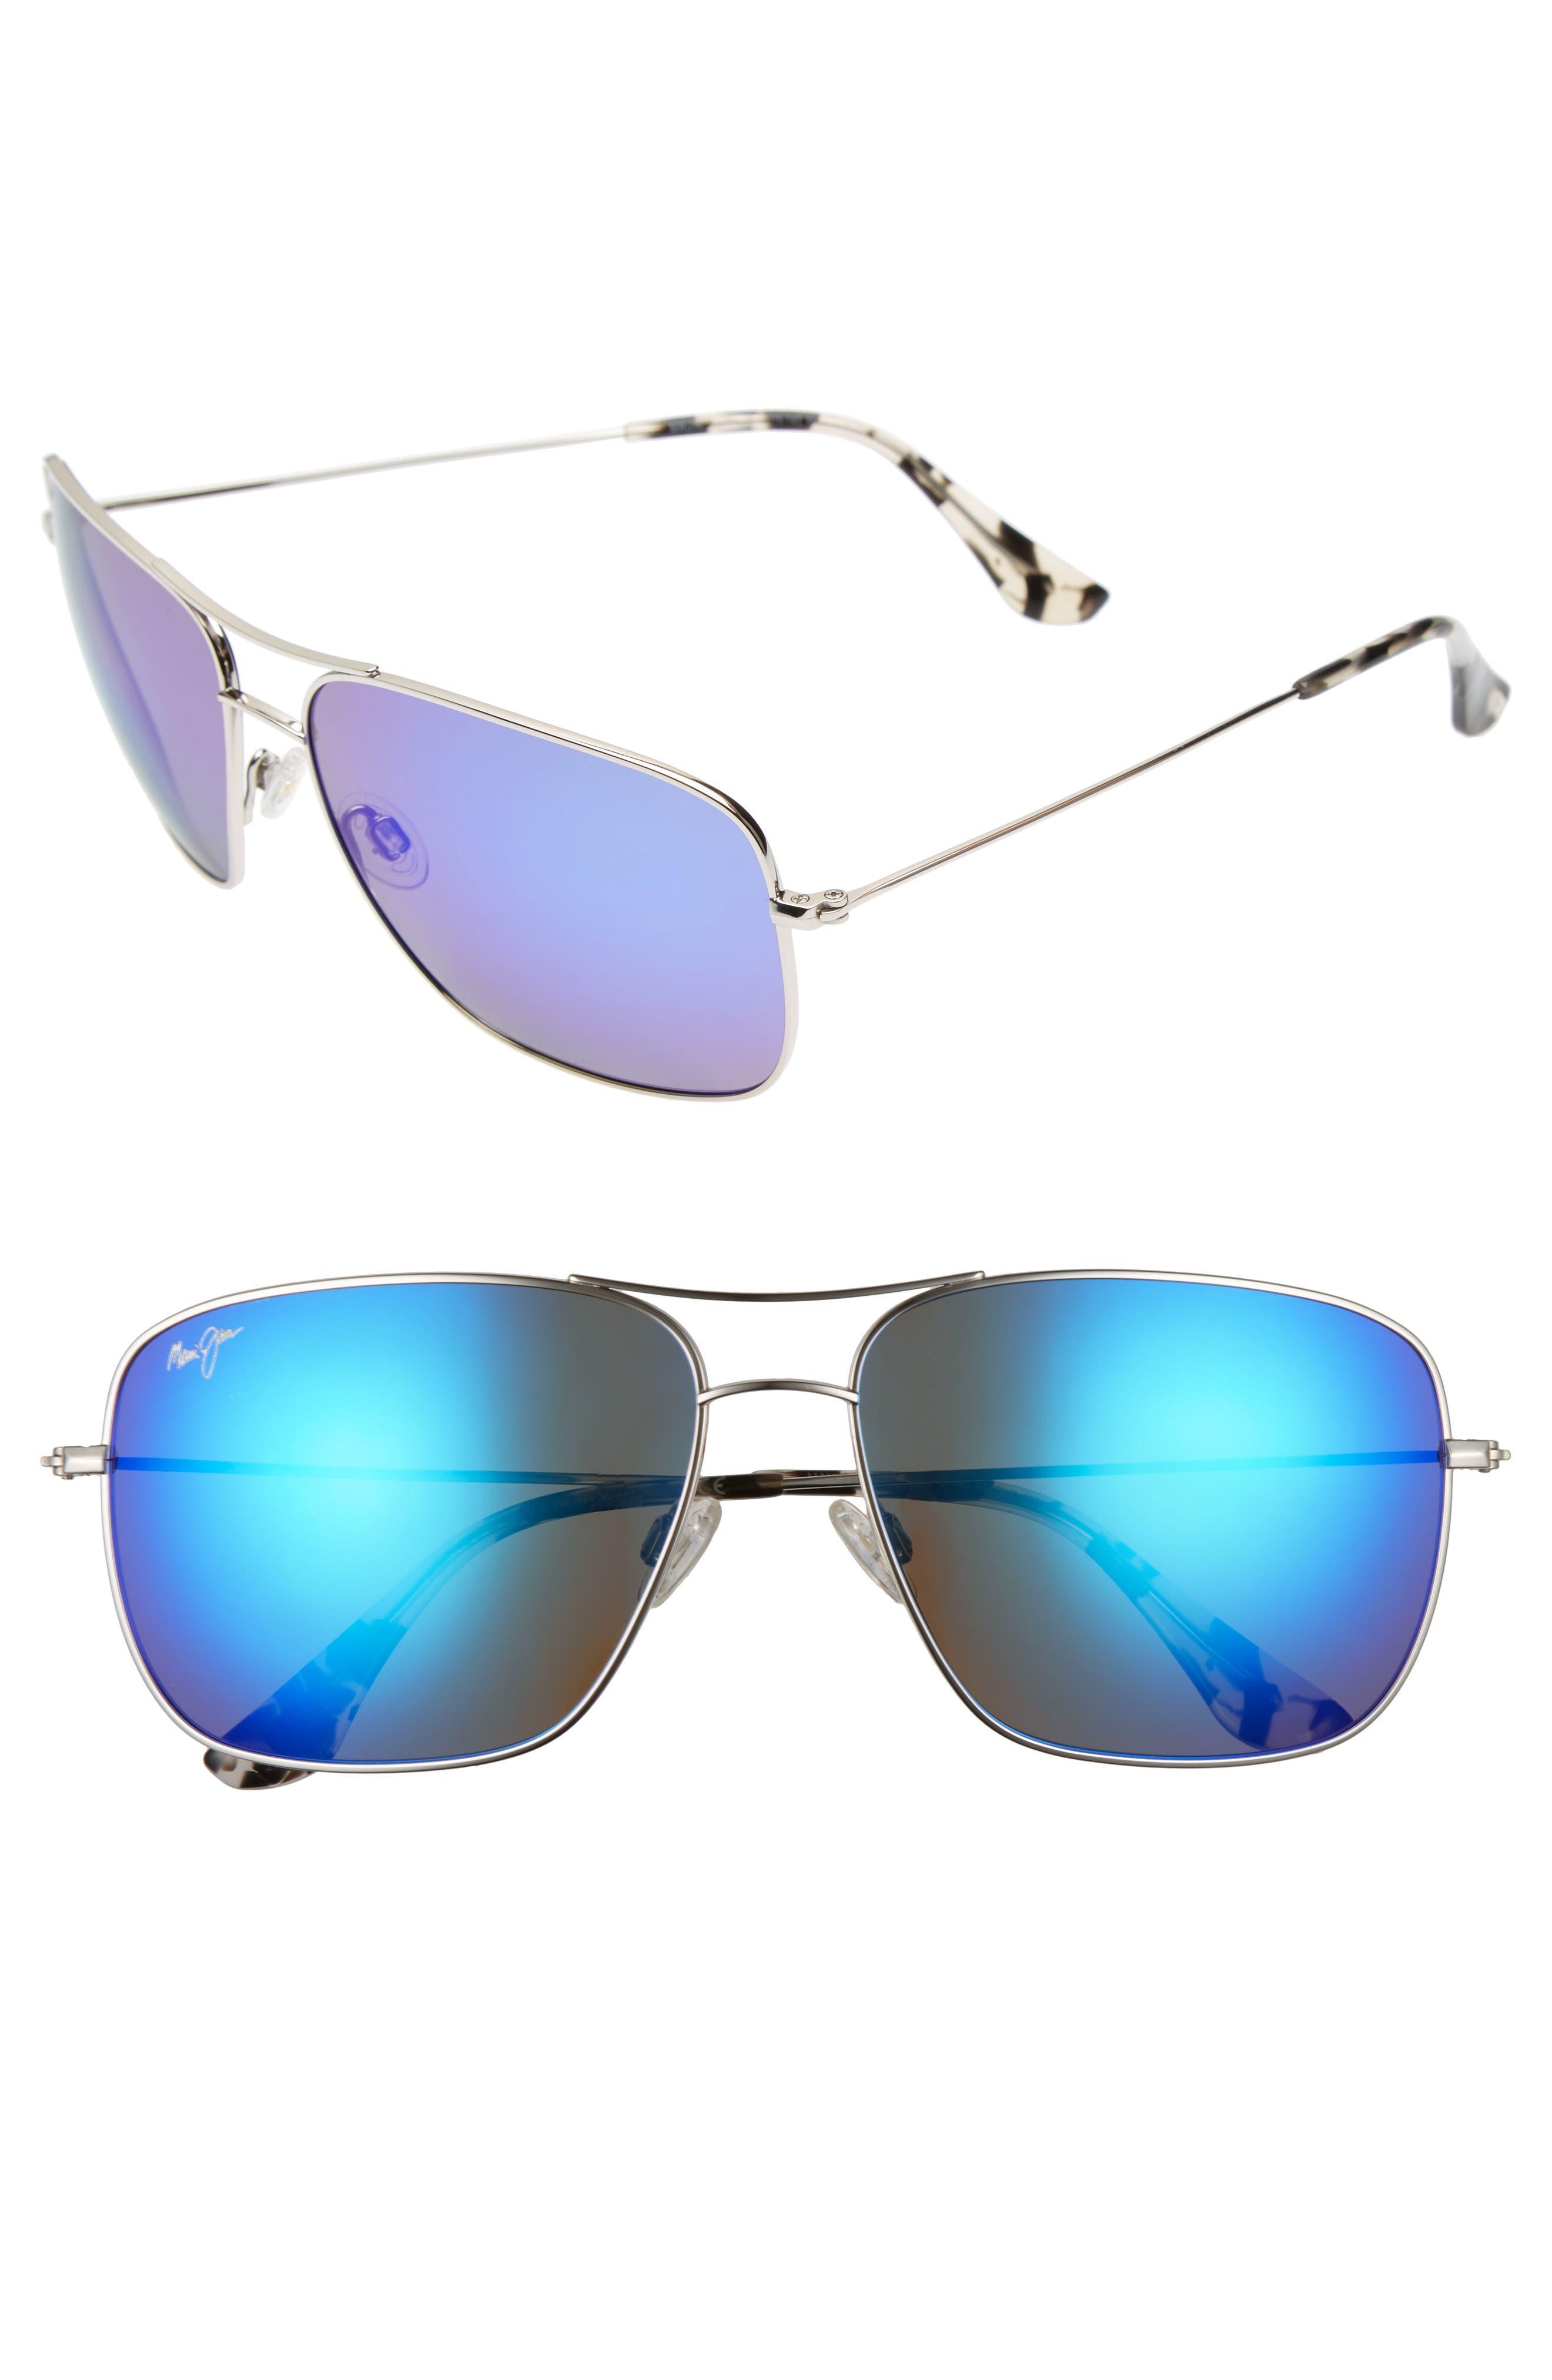 Cook Pines 63mm Polarized Titanium Aviator Sunglasses,                             Main thumbnail 1, color,                             Silver/ Blue Hawaii